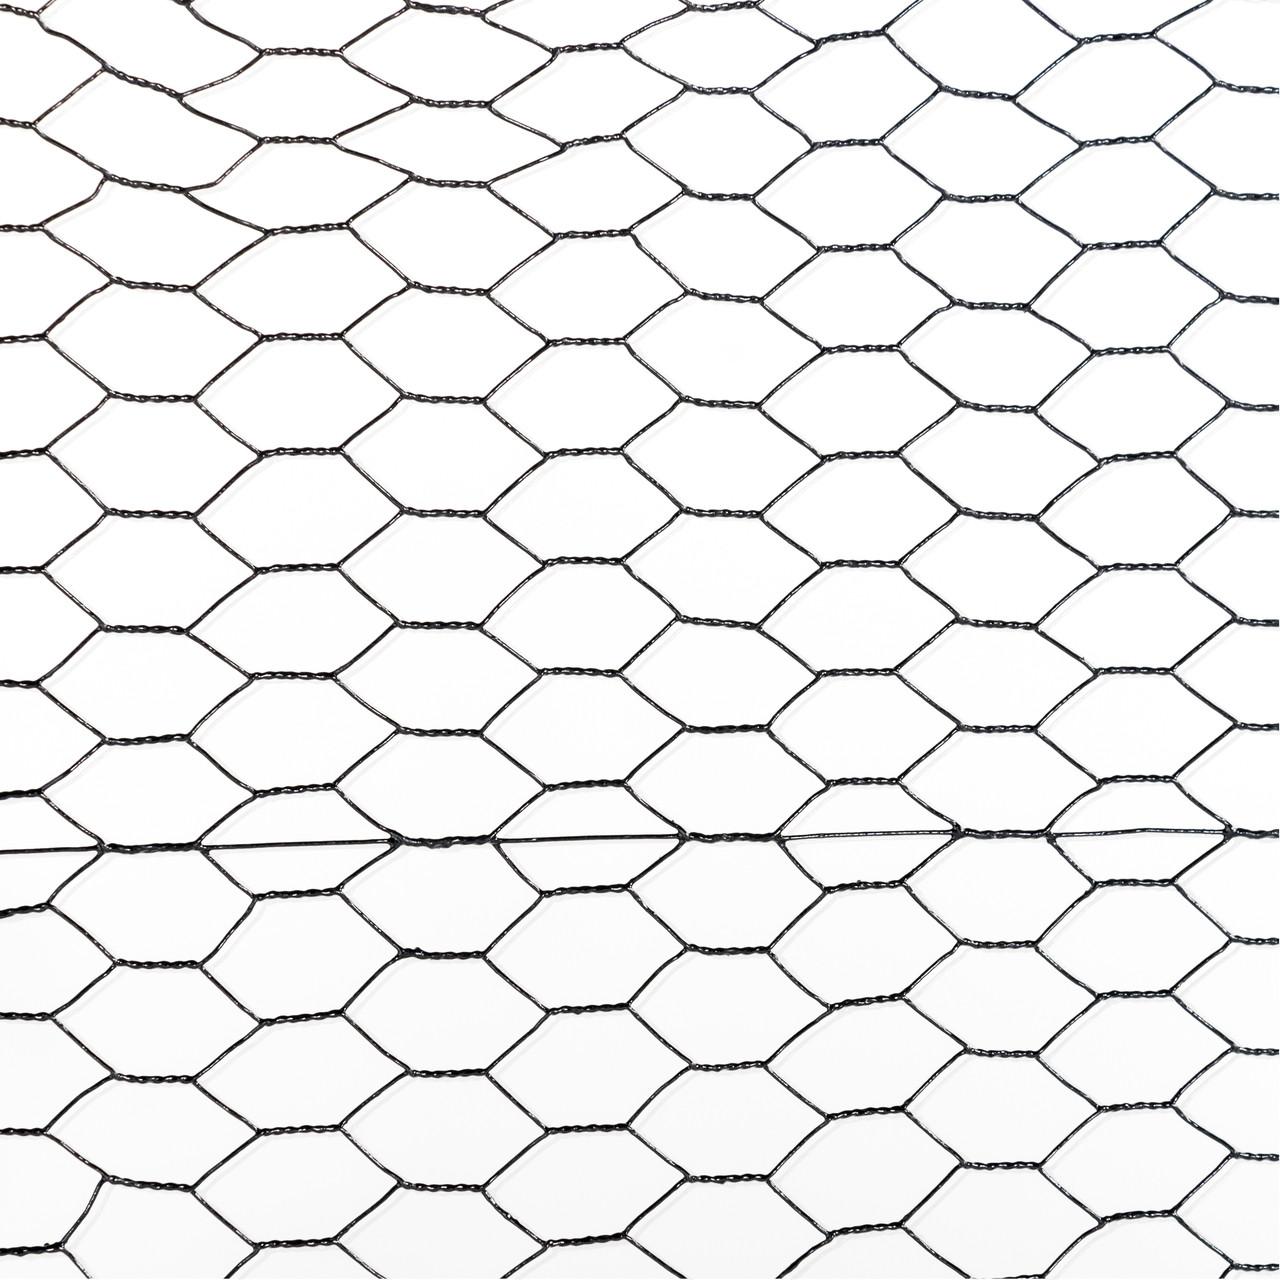 20 gauge black vinyl coated poultry hex netting with 1 inch mesh Small Gauge Yarn 20 gauge black vinyl coated poultry hex netting with 1 inch mesh